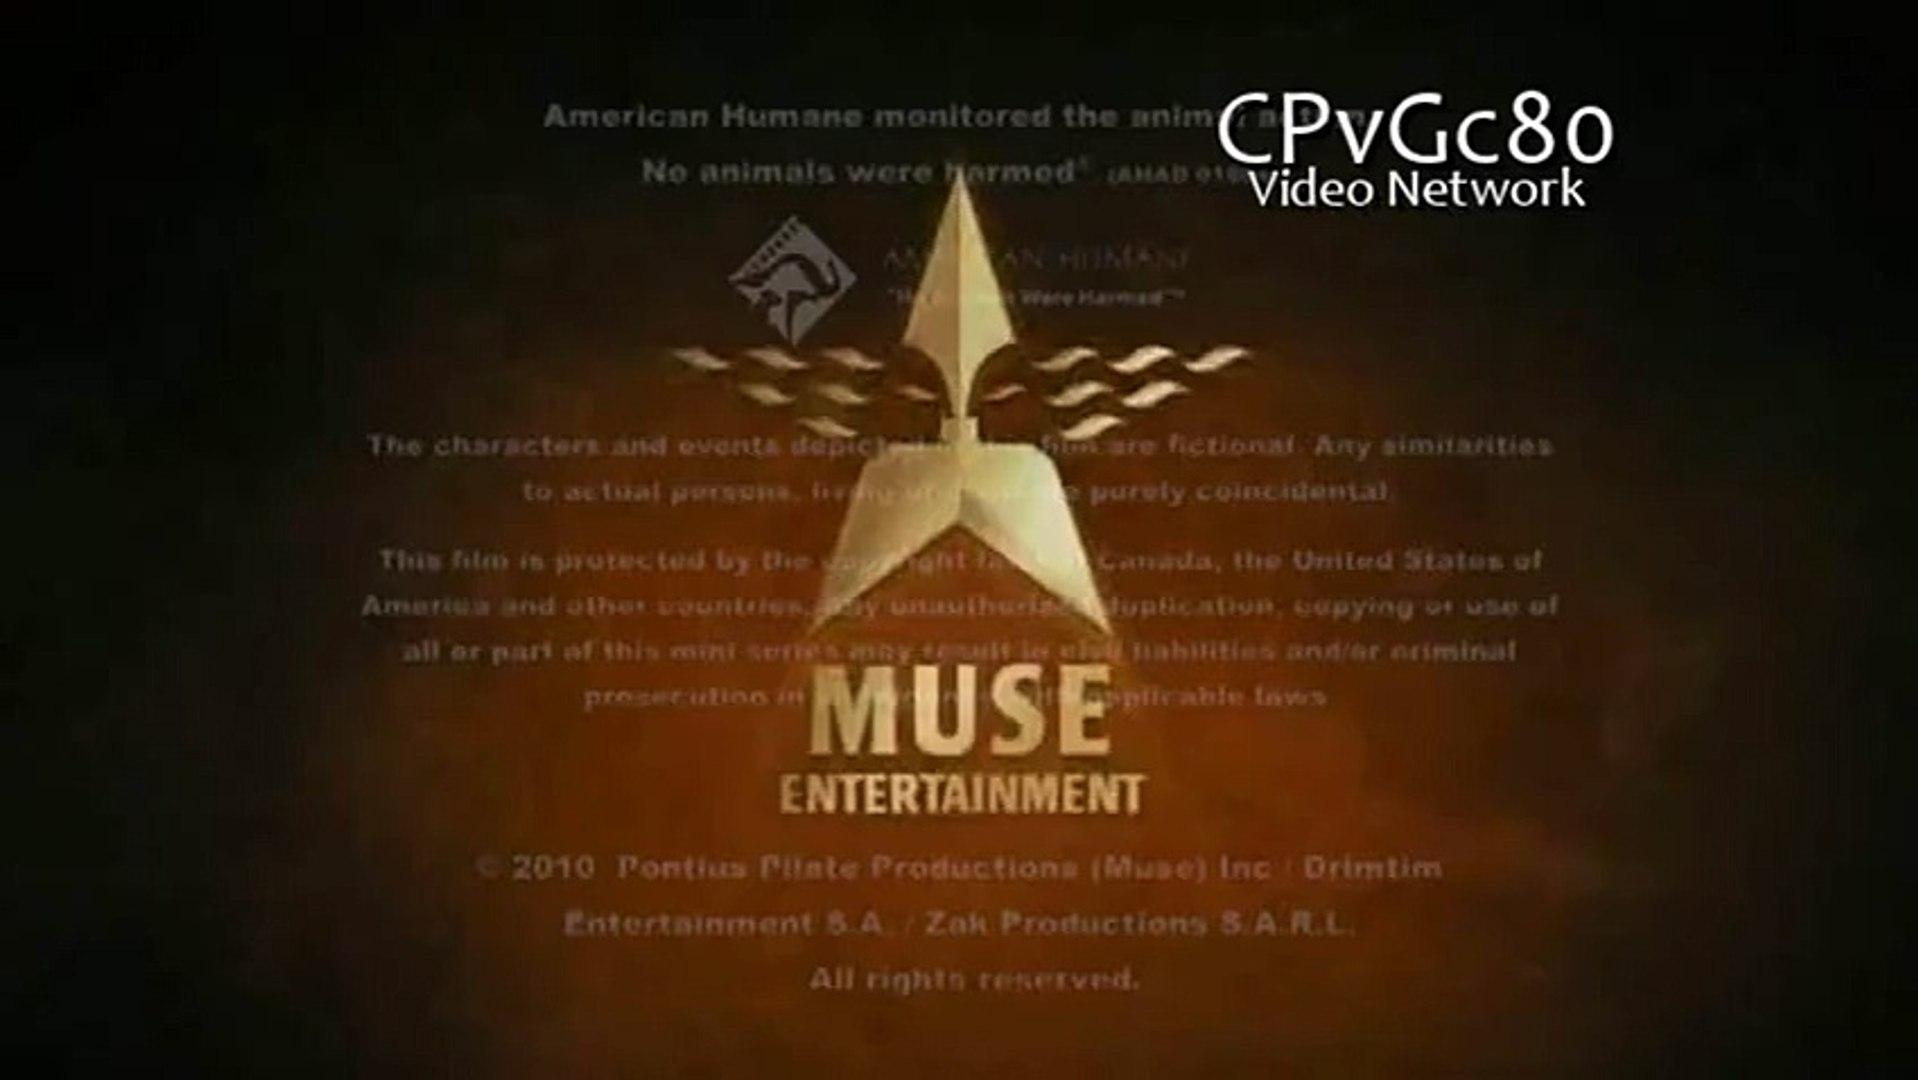 Drimtim Entertainment / Muse Entertainment (2010)